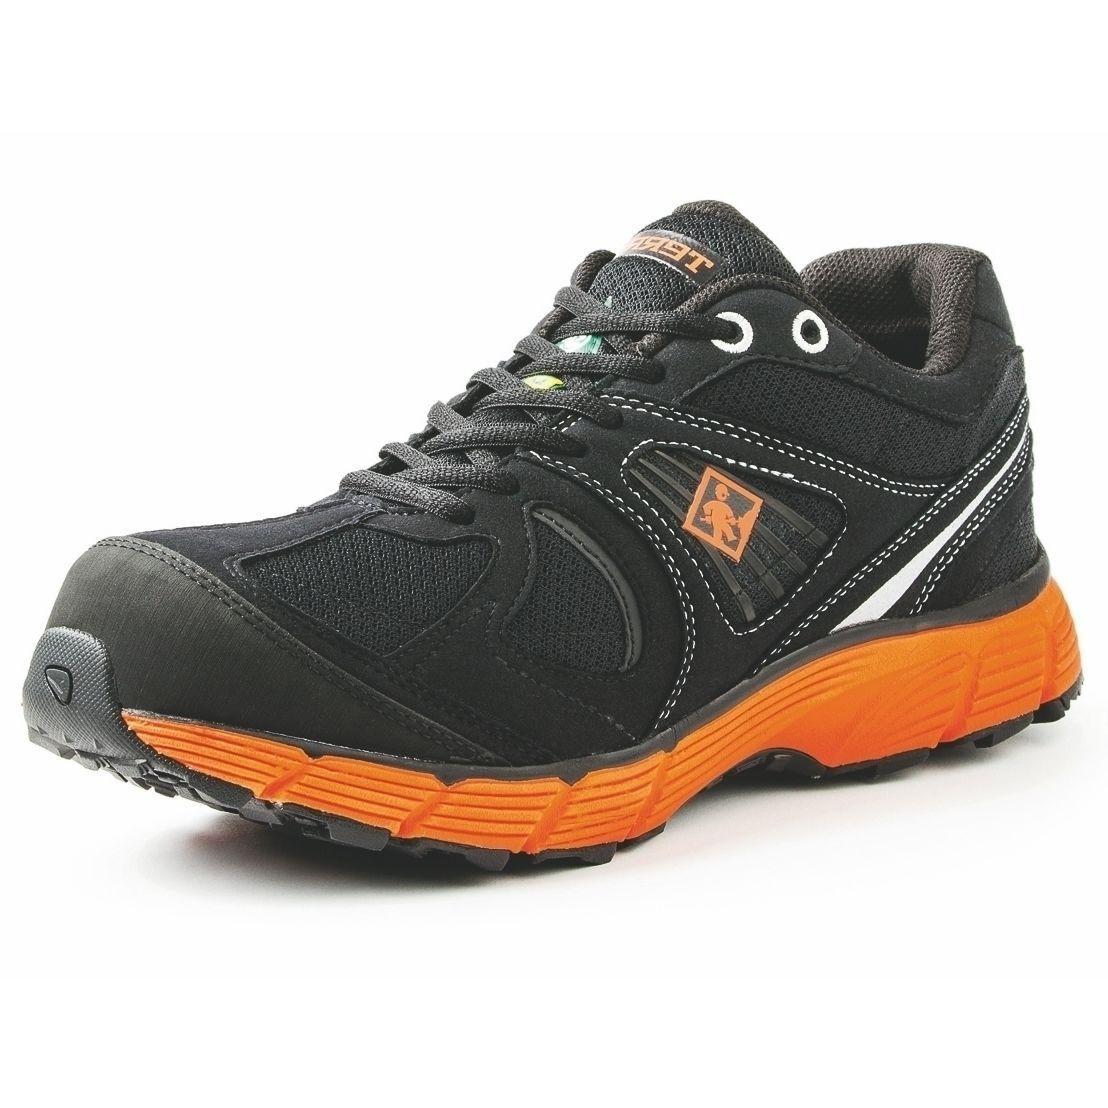 Terra Berufsschuhe Halbschuhe 38 Pacer S1P schwarz/orange Gr. 38 Halbschuhe Neu Y276 49b902